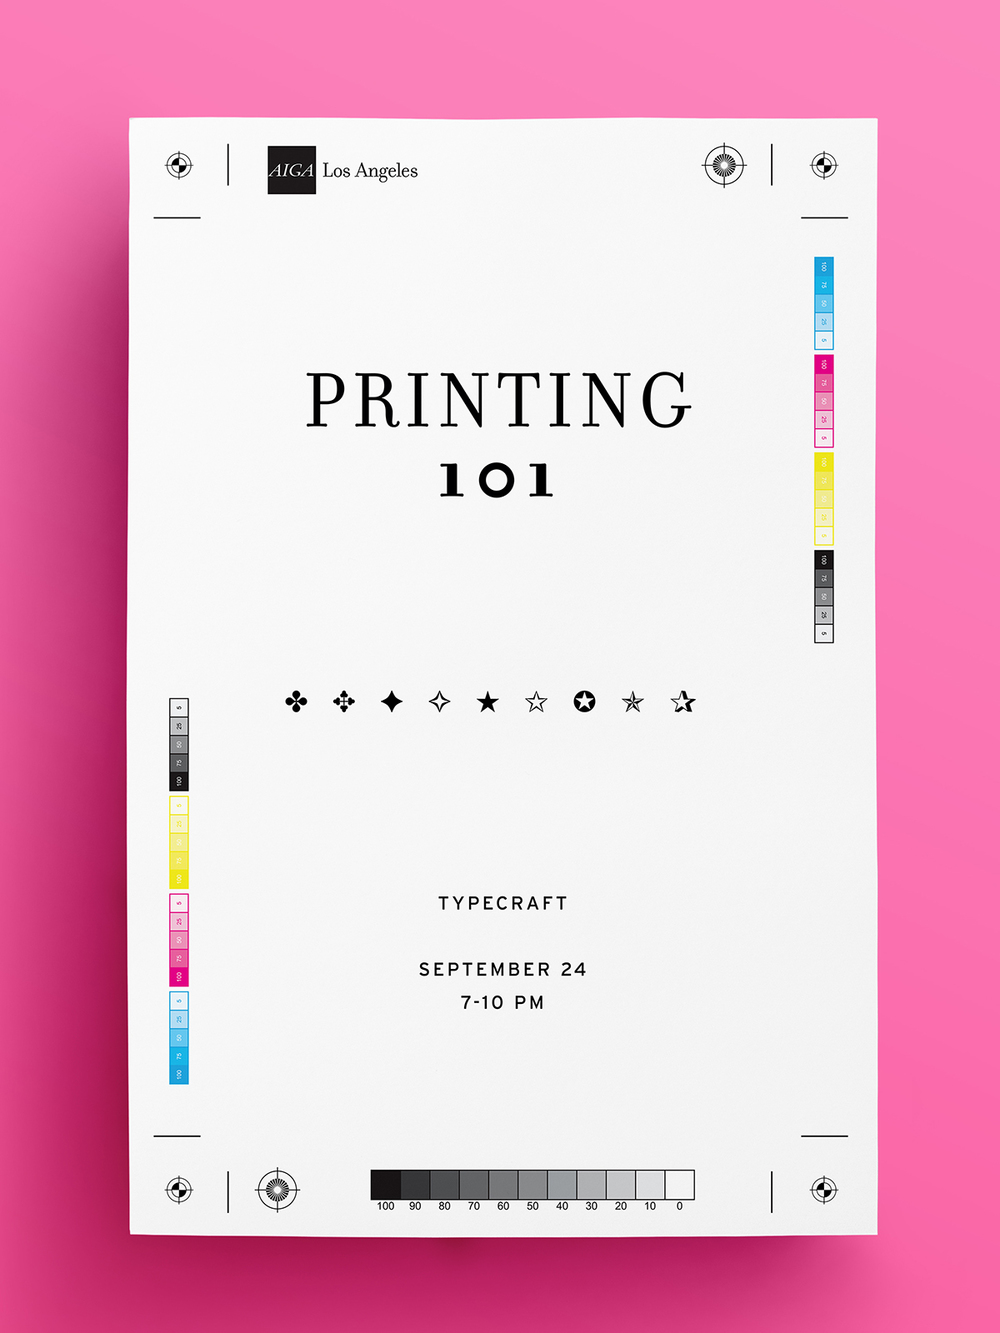 Printing 101 at Typecraft